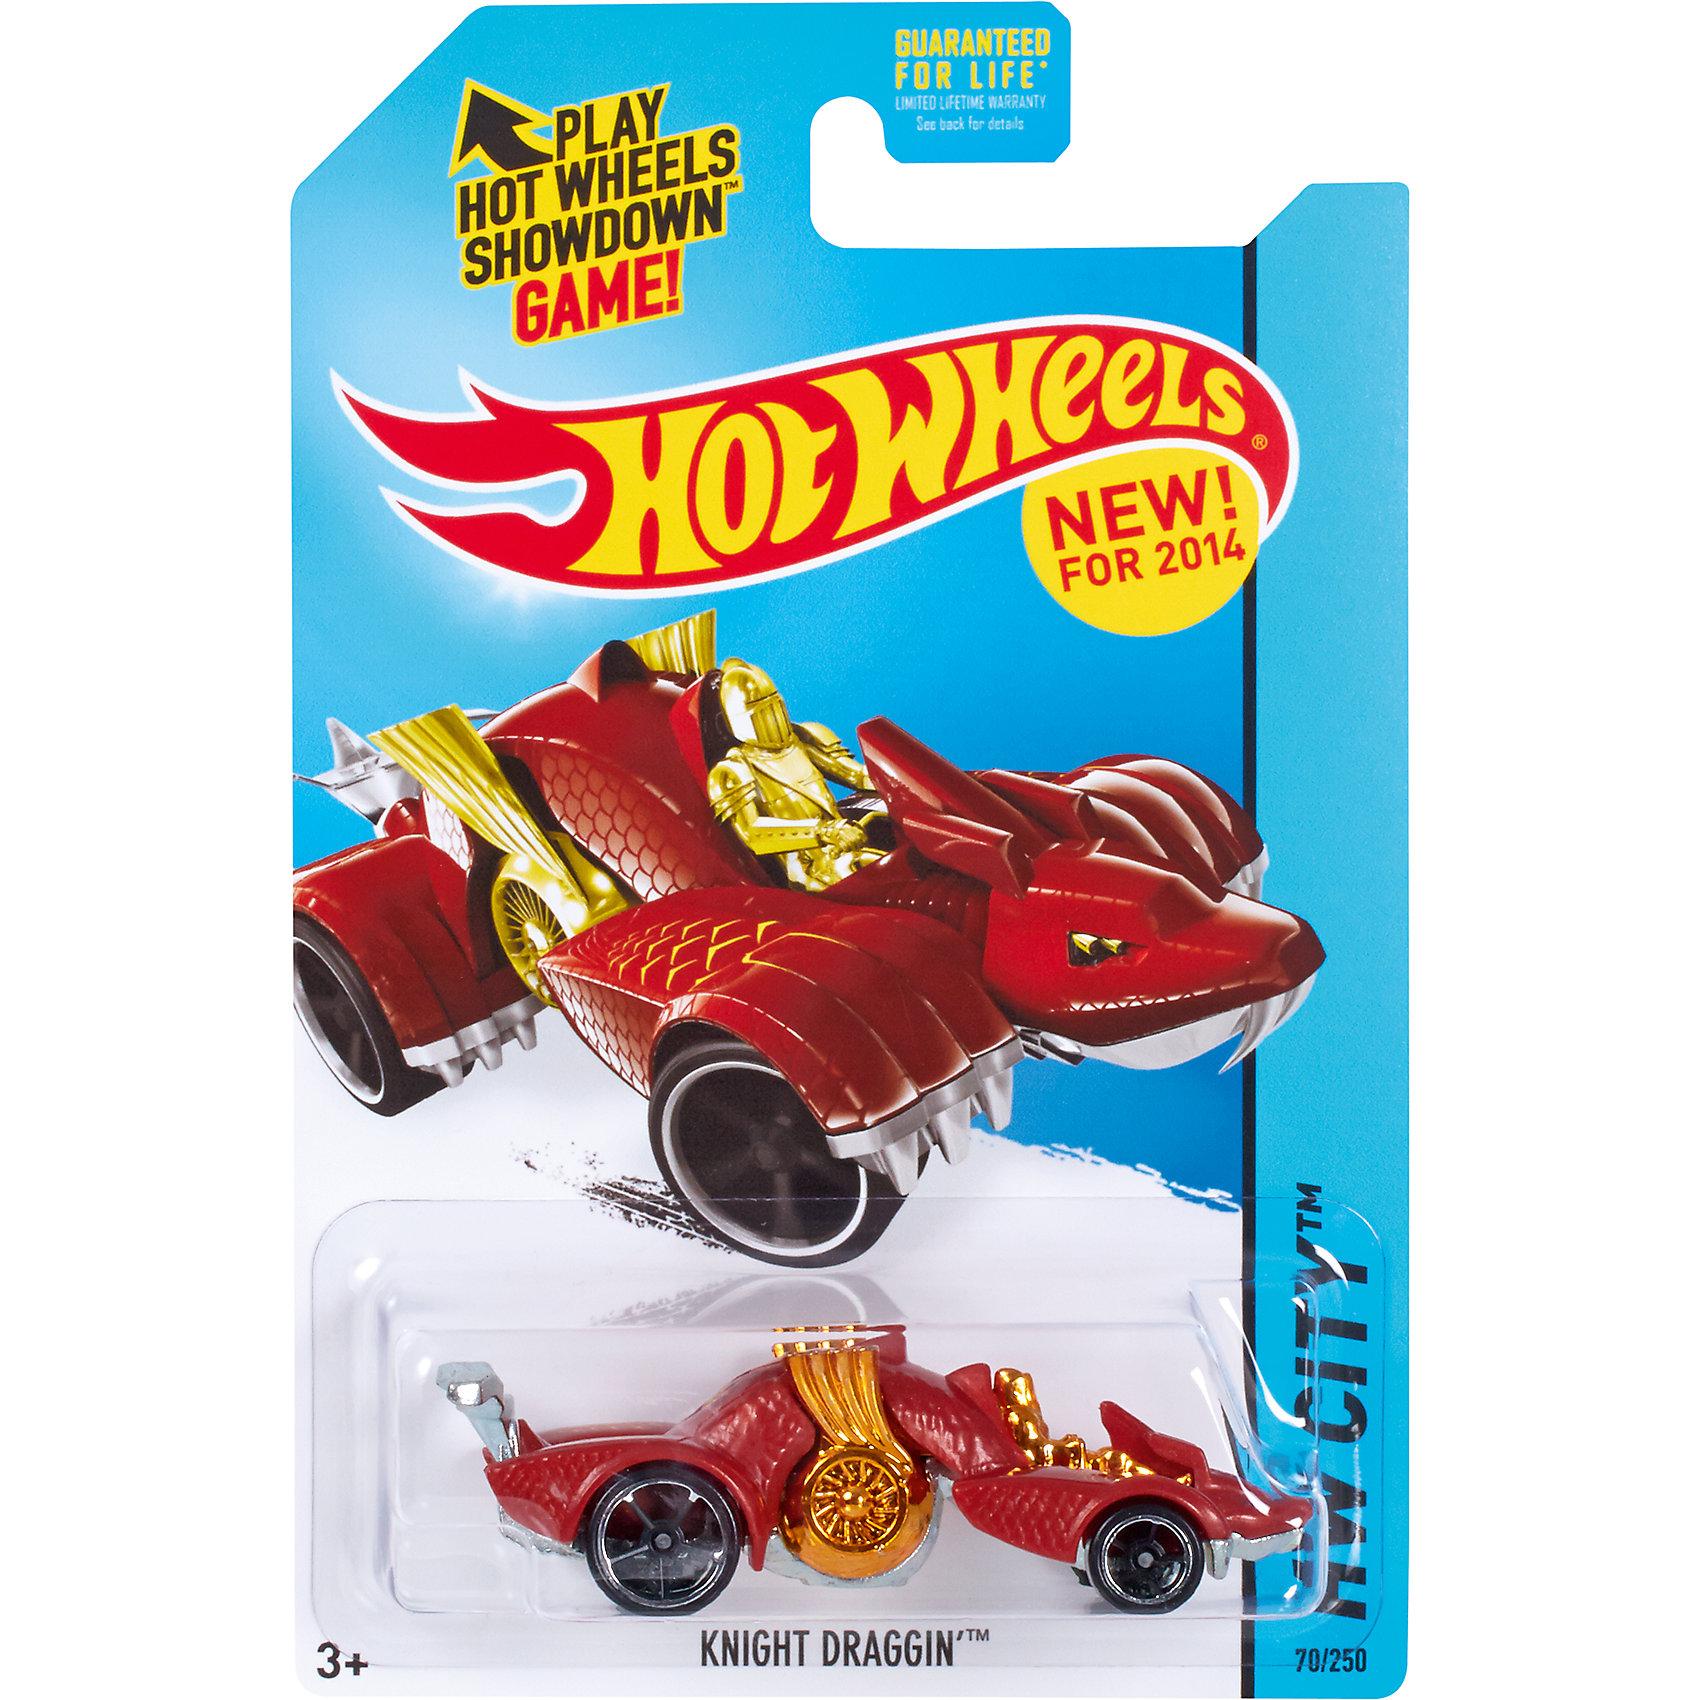 Базовая машинка Hot Wheels, Knight DragginМашинки<br><br><br>Ширина мм: 110<br>Глубина мм: 45<br>Высота мм: 110<br>Вес г: 30<br>Возраст от месяцев: 36<br>Возраст до месяцев: 96<br>Пол: Мужской<br>Возраст: Детский<br>SKU: 7111916